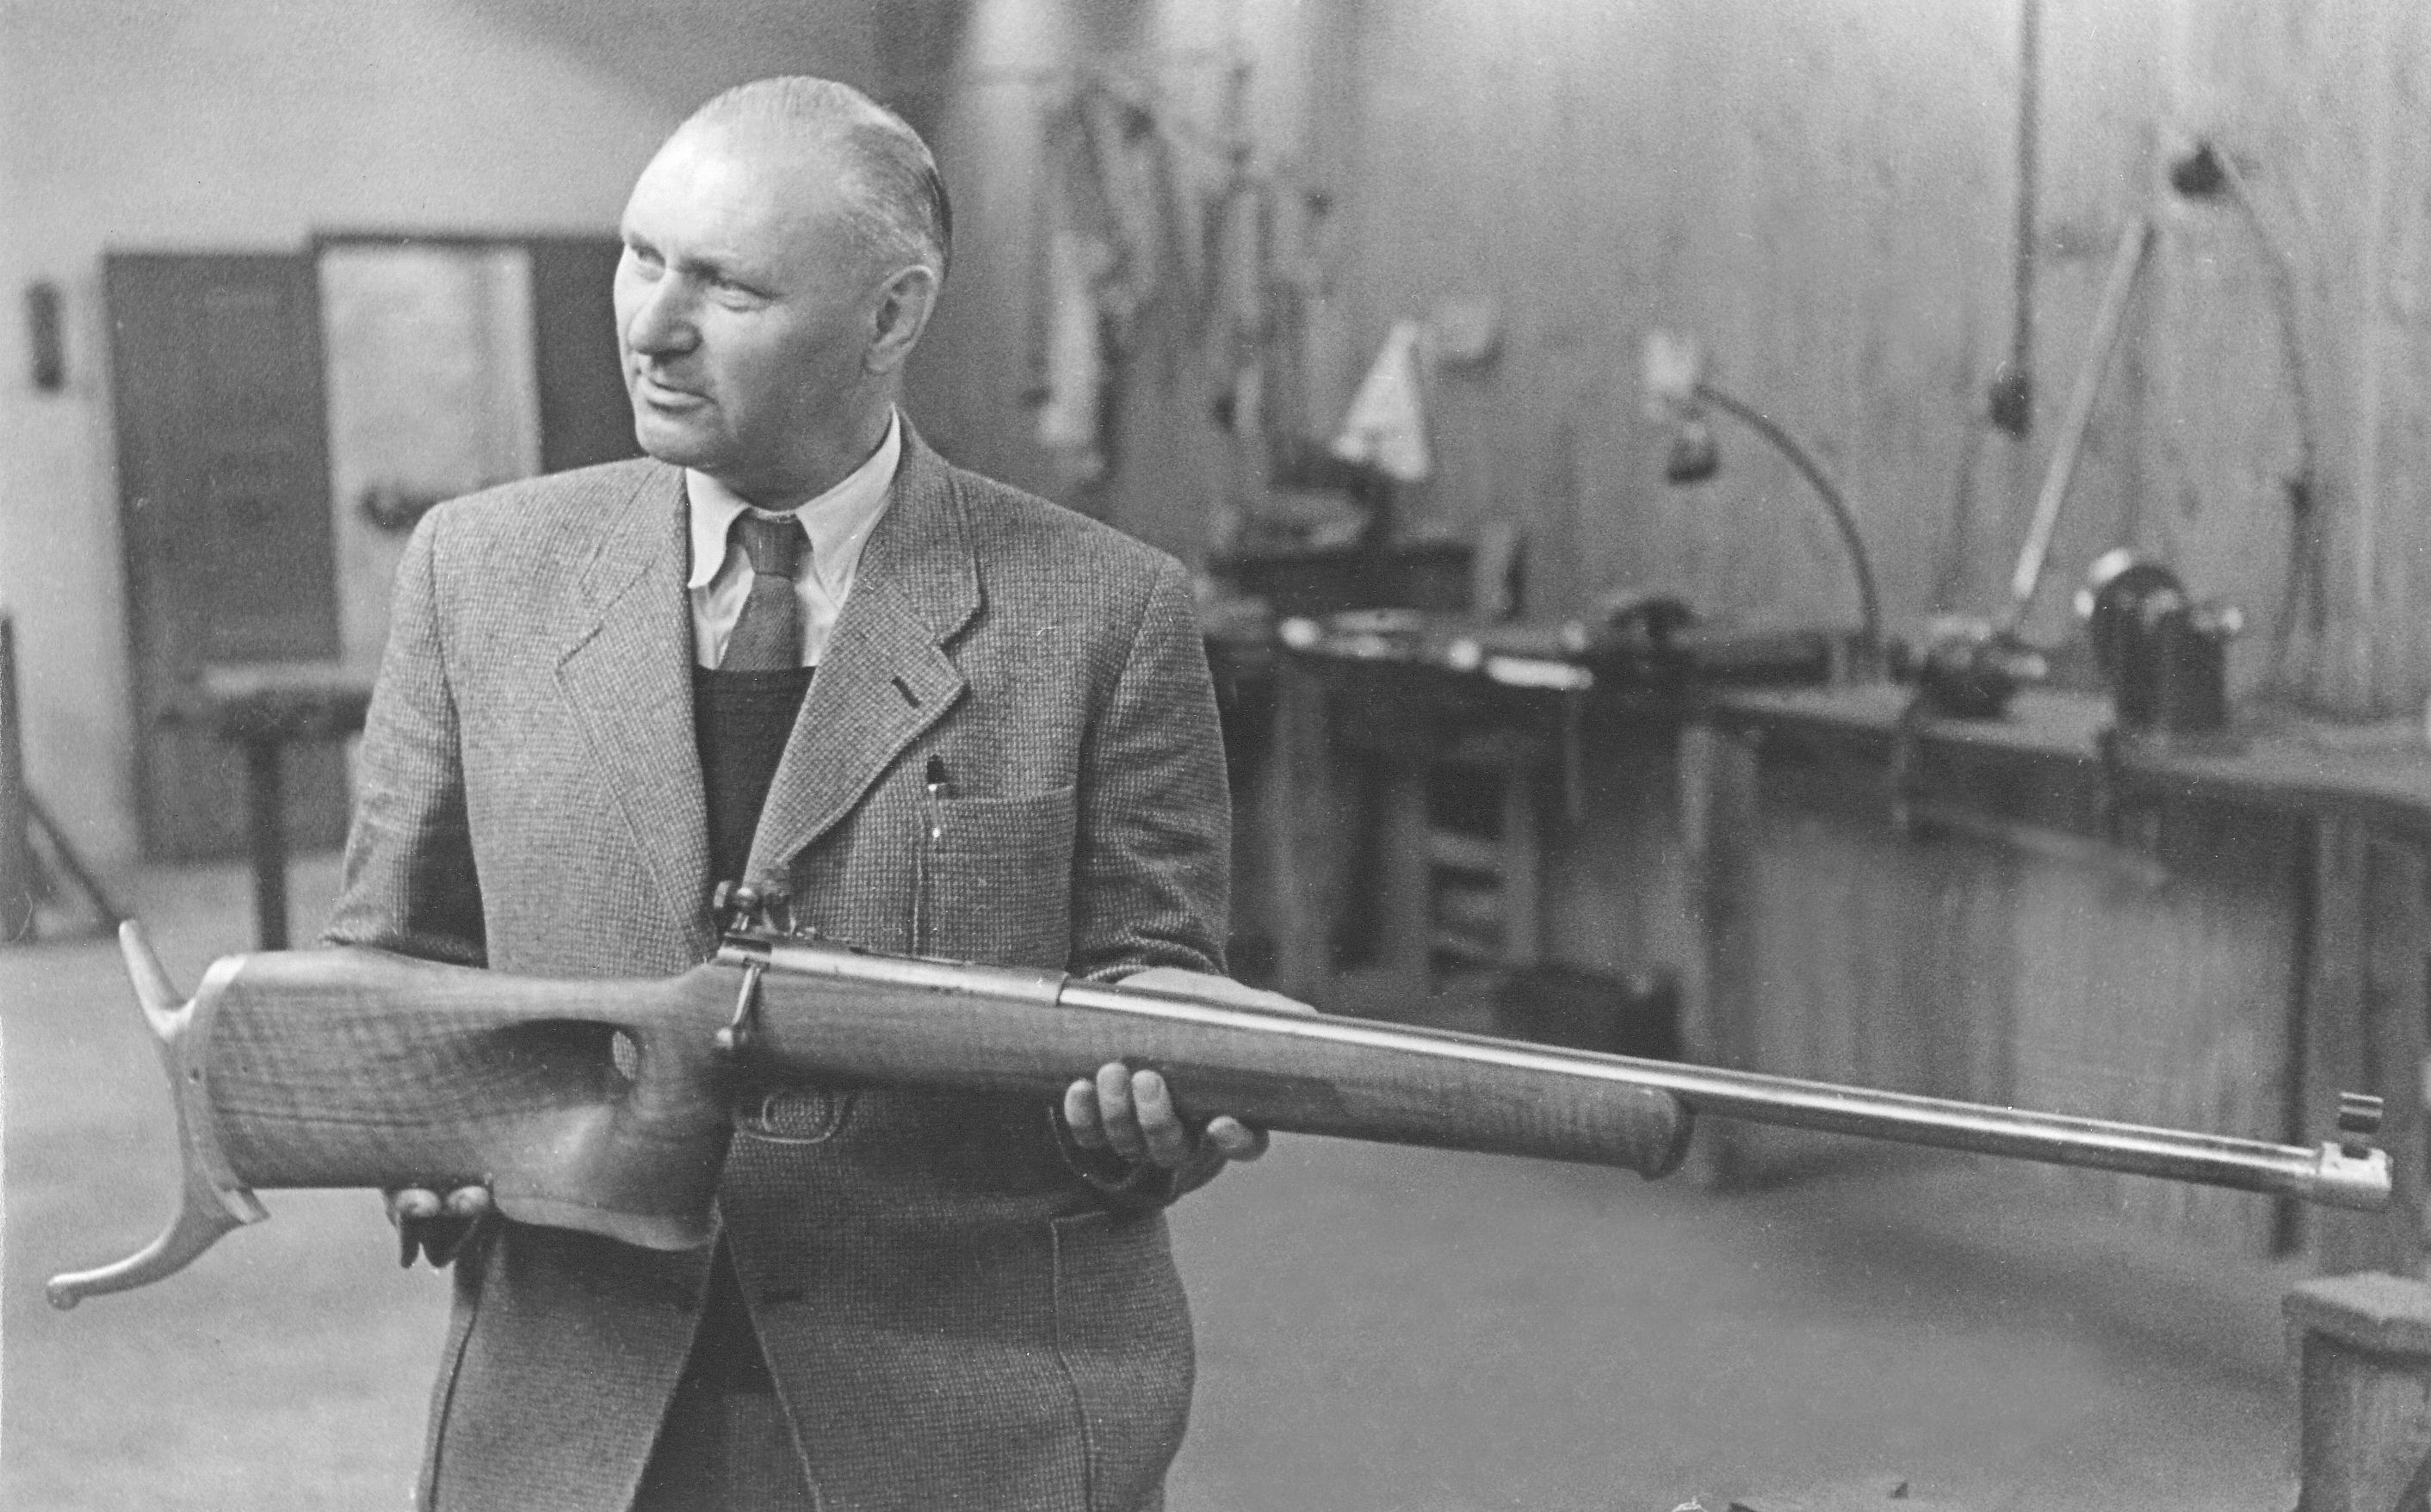 Neils Larsen Schultz & Larsen Olympic target rifle